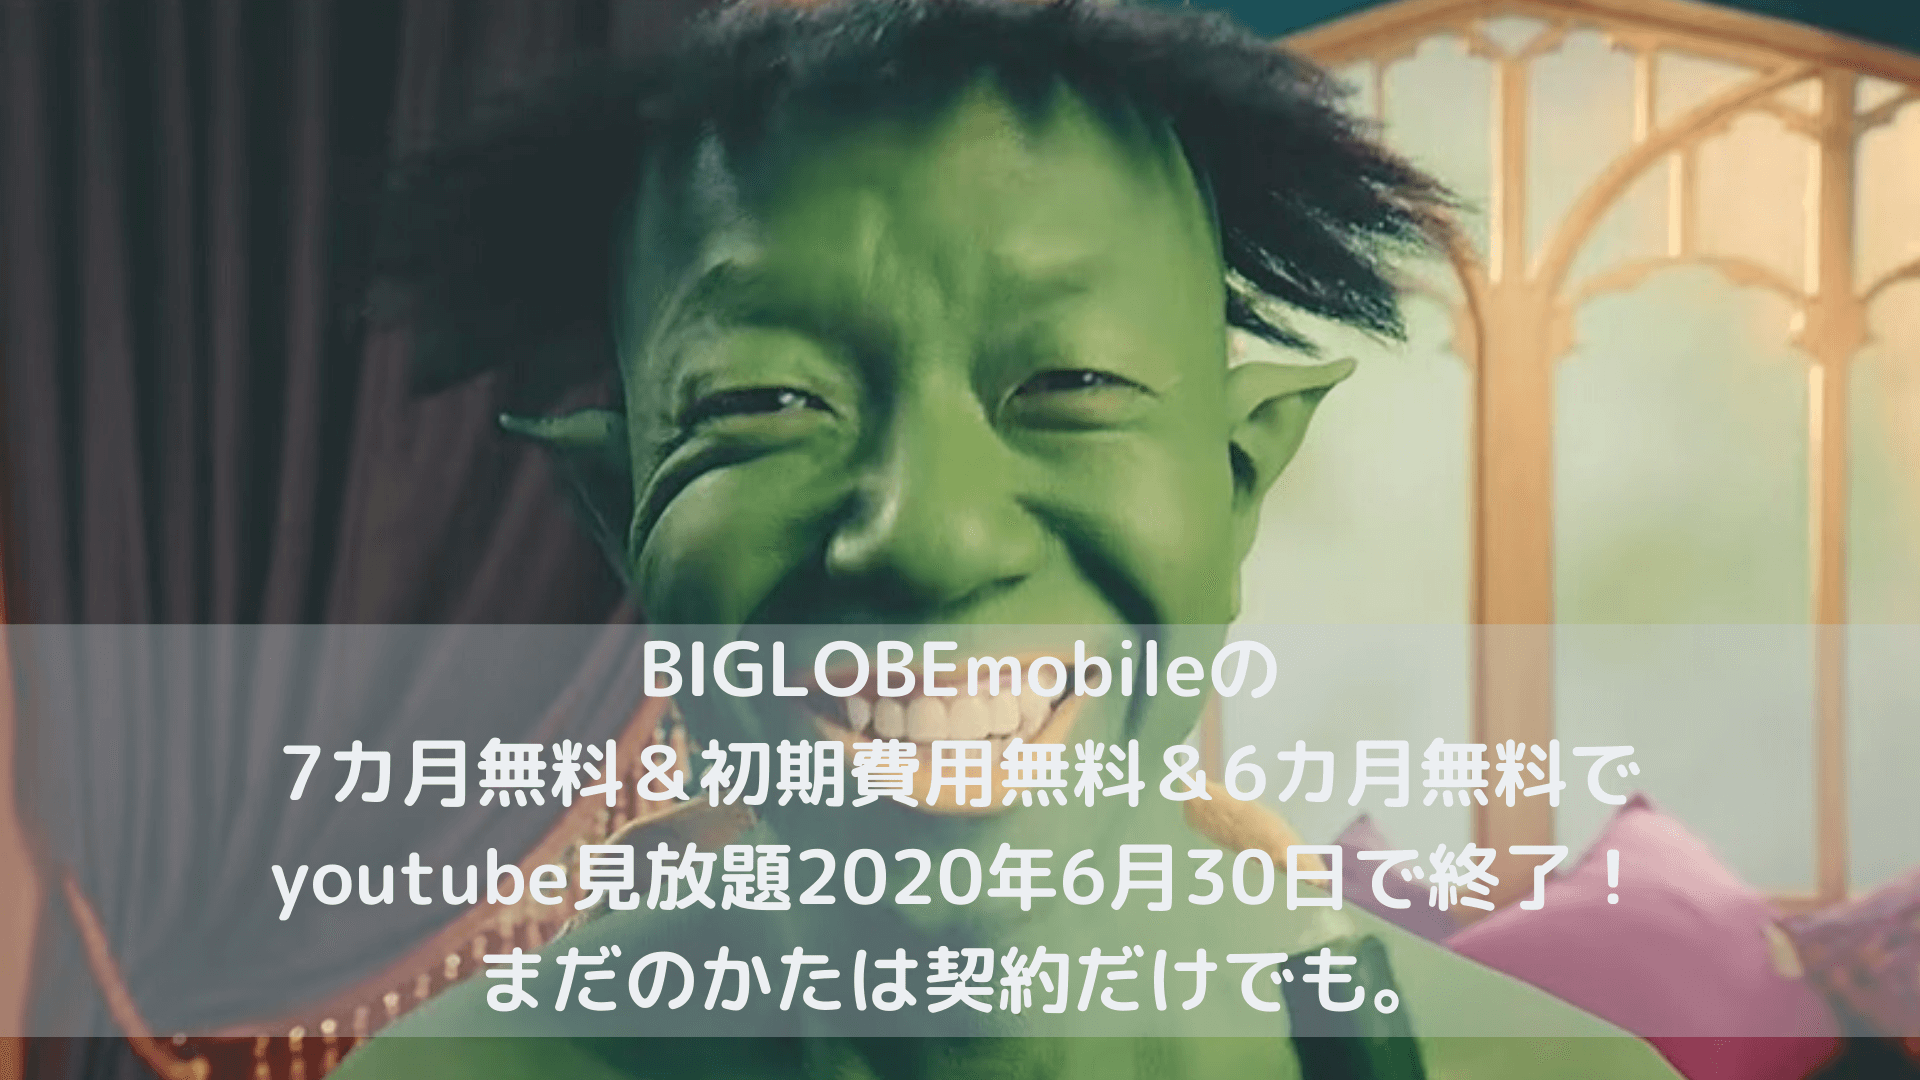 BIGLOBEmobileの7カ月無料&初期費用無料&6カ月無料でyoutube見放題2020年6月30日で終了!まだのかたは契約だけでも。